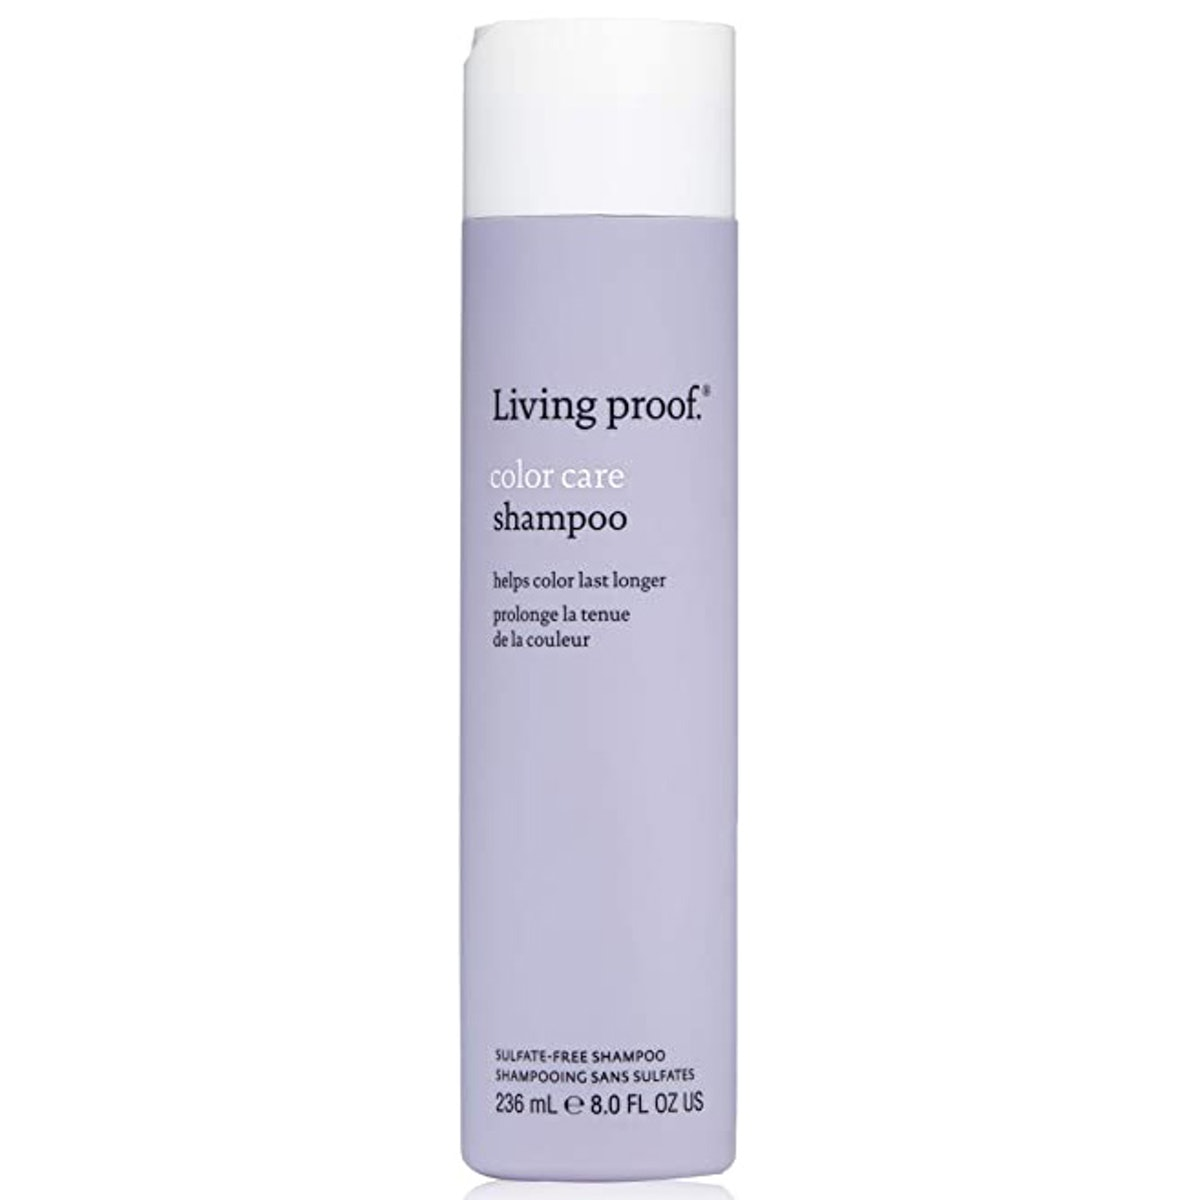 Living proof Color Care Shampoo